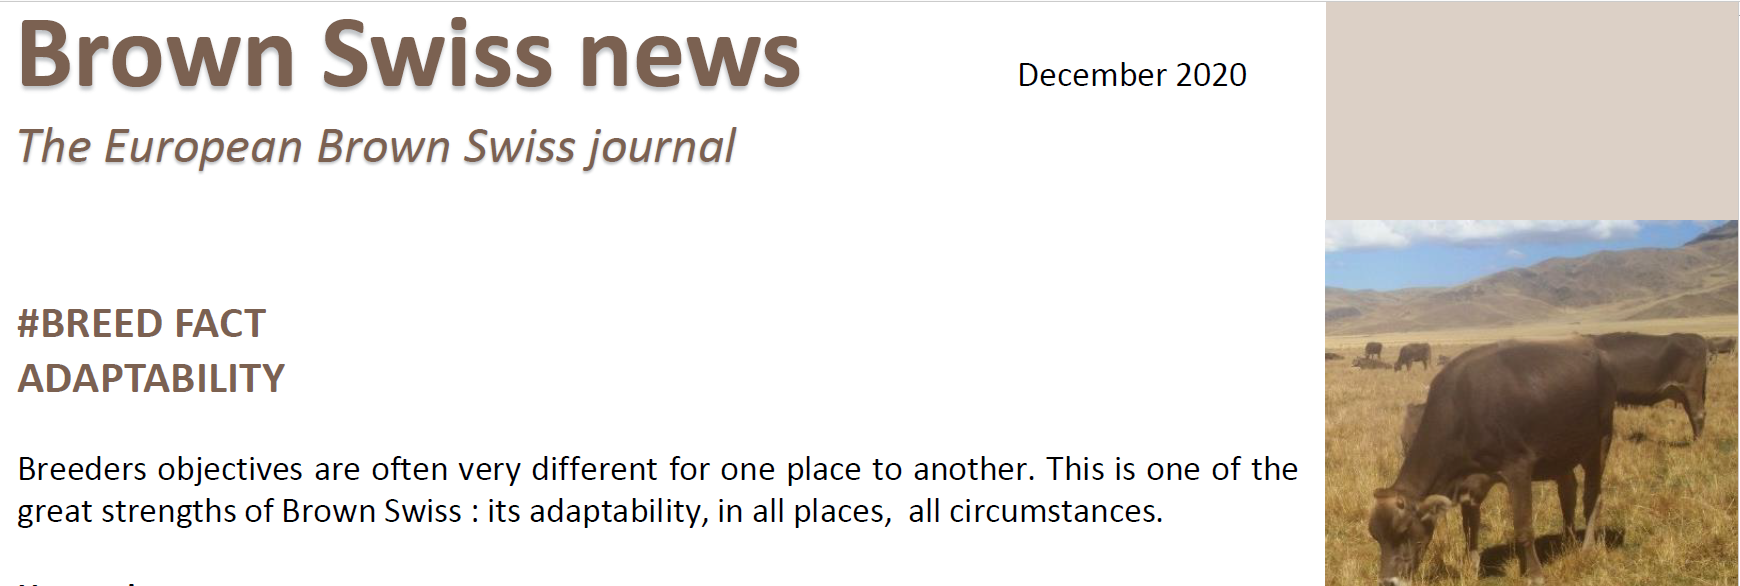 December 2020     Newsletter of the European Brown Swiss